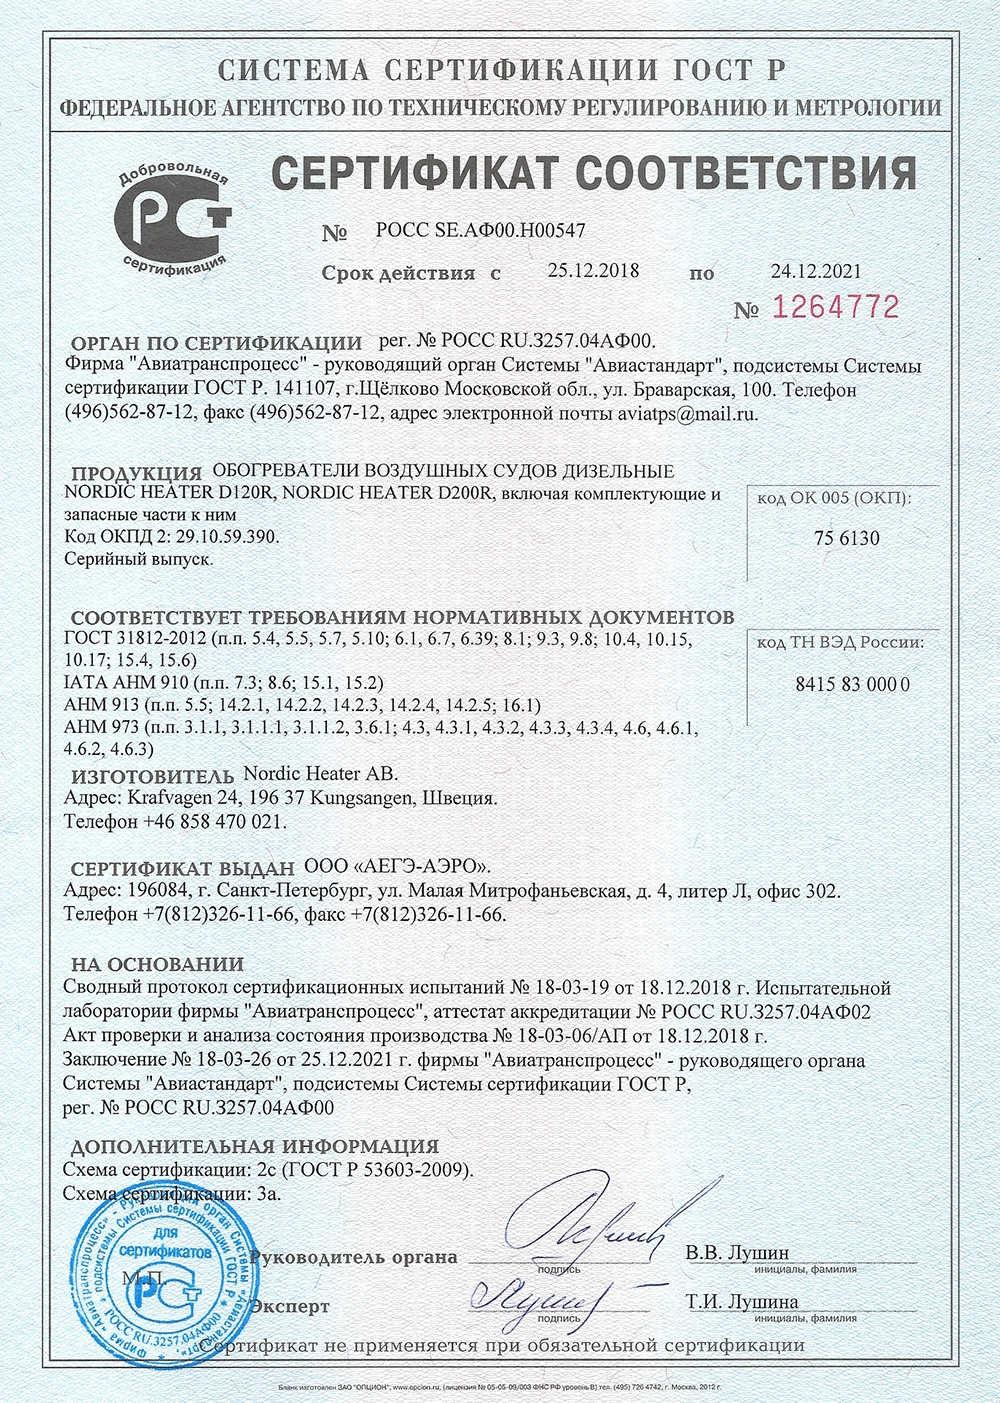 31812-2012-Nordic-Heater-D120R-D200R